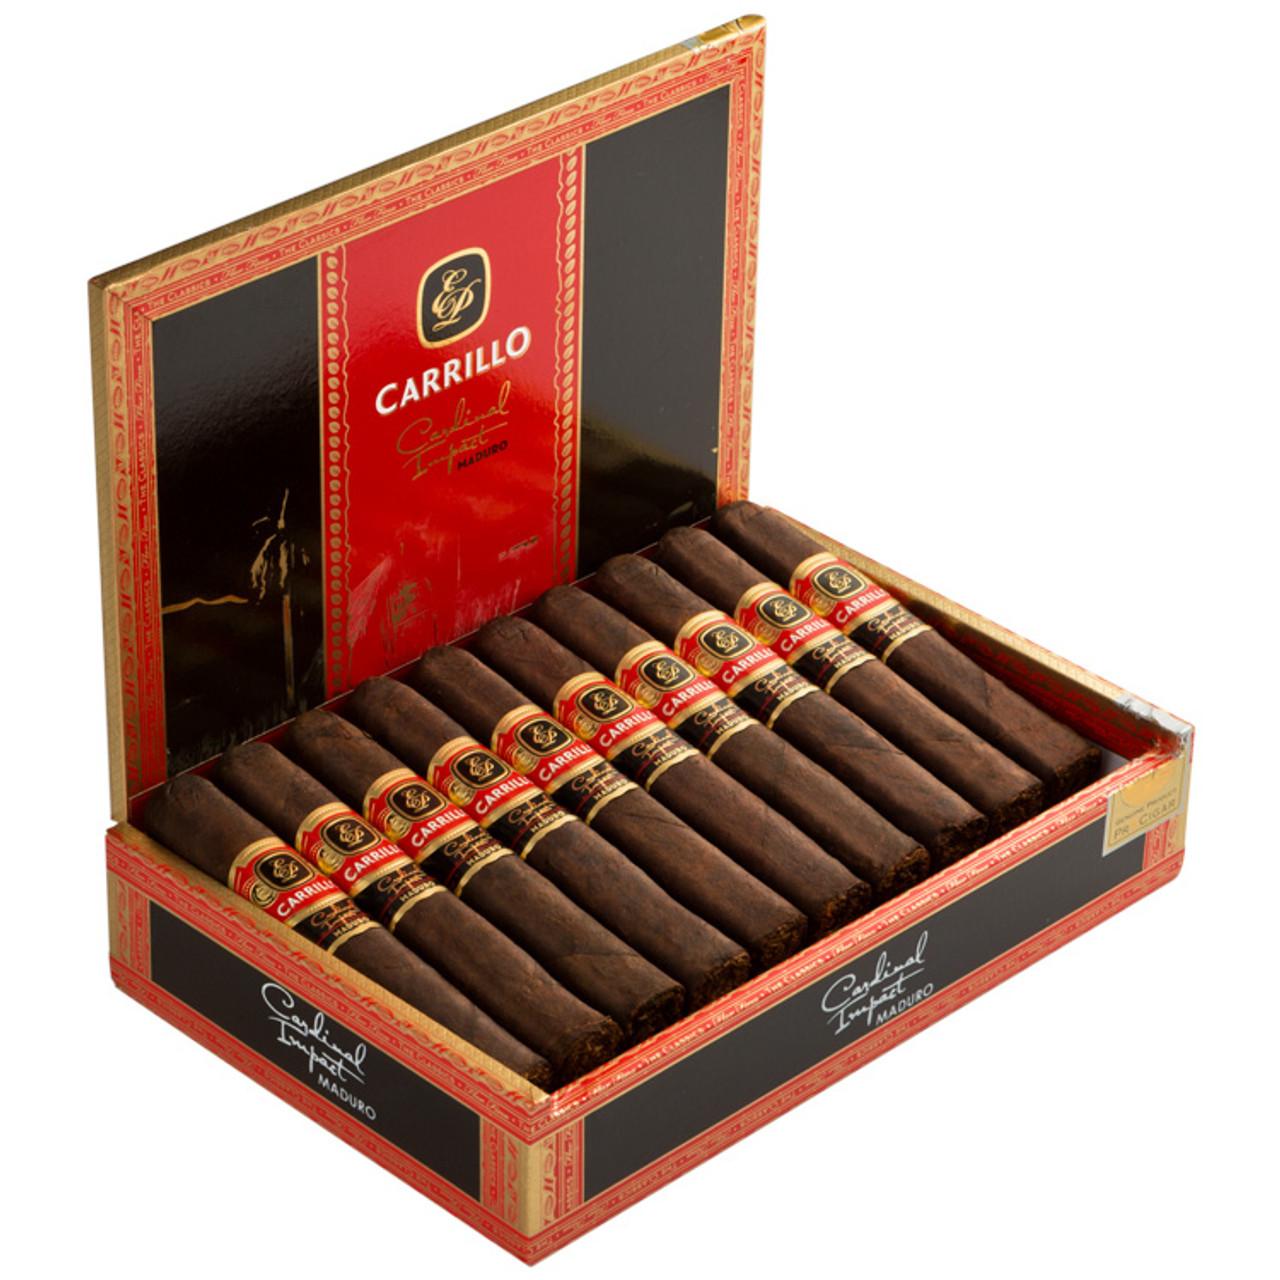 E.P. Carrillo Cardinal Impact No. 56 Maduro Cigars - 5.5 x 56 (Box of 20)